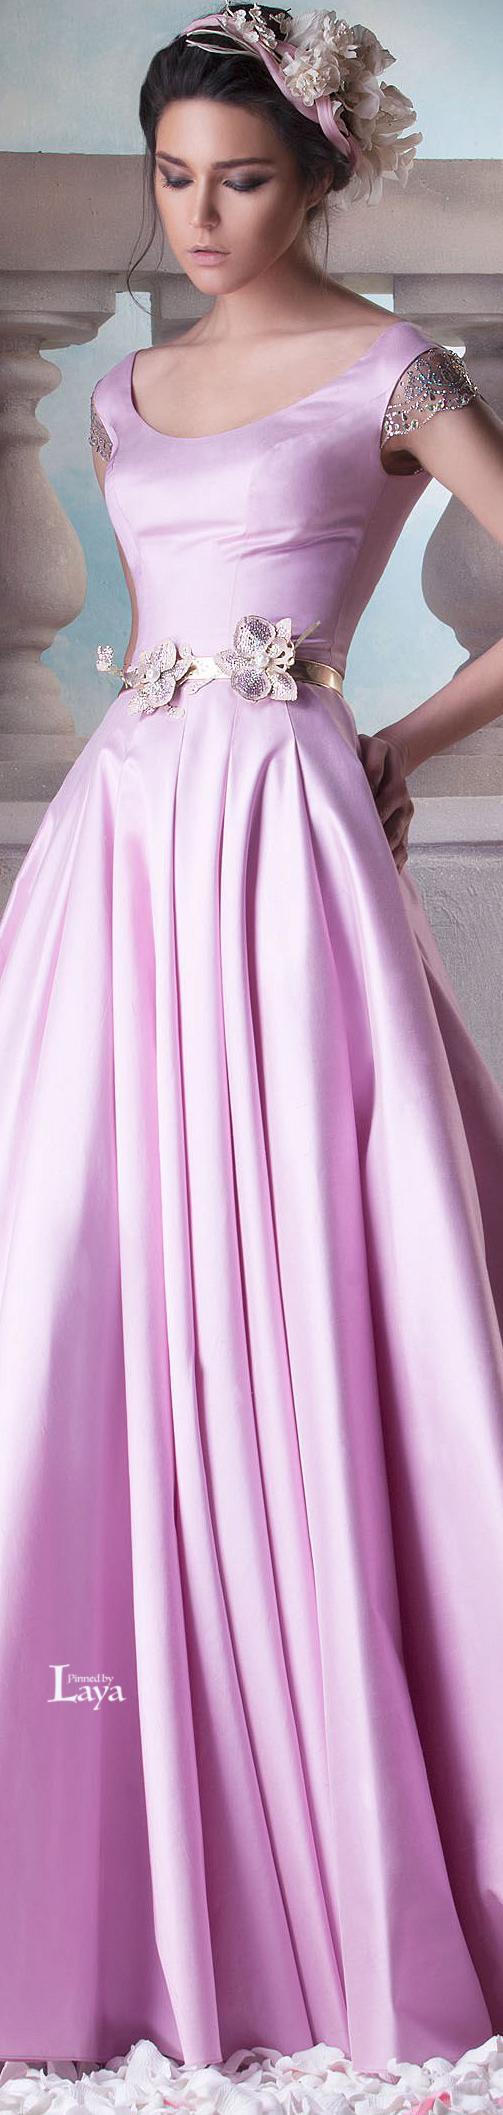 HANNA TOUMA S/S 2015 COUTURE   Cute Styles...I Love Them ...